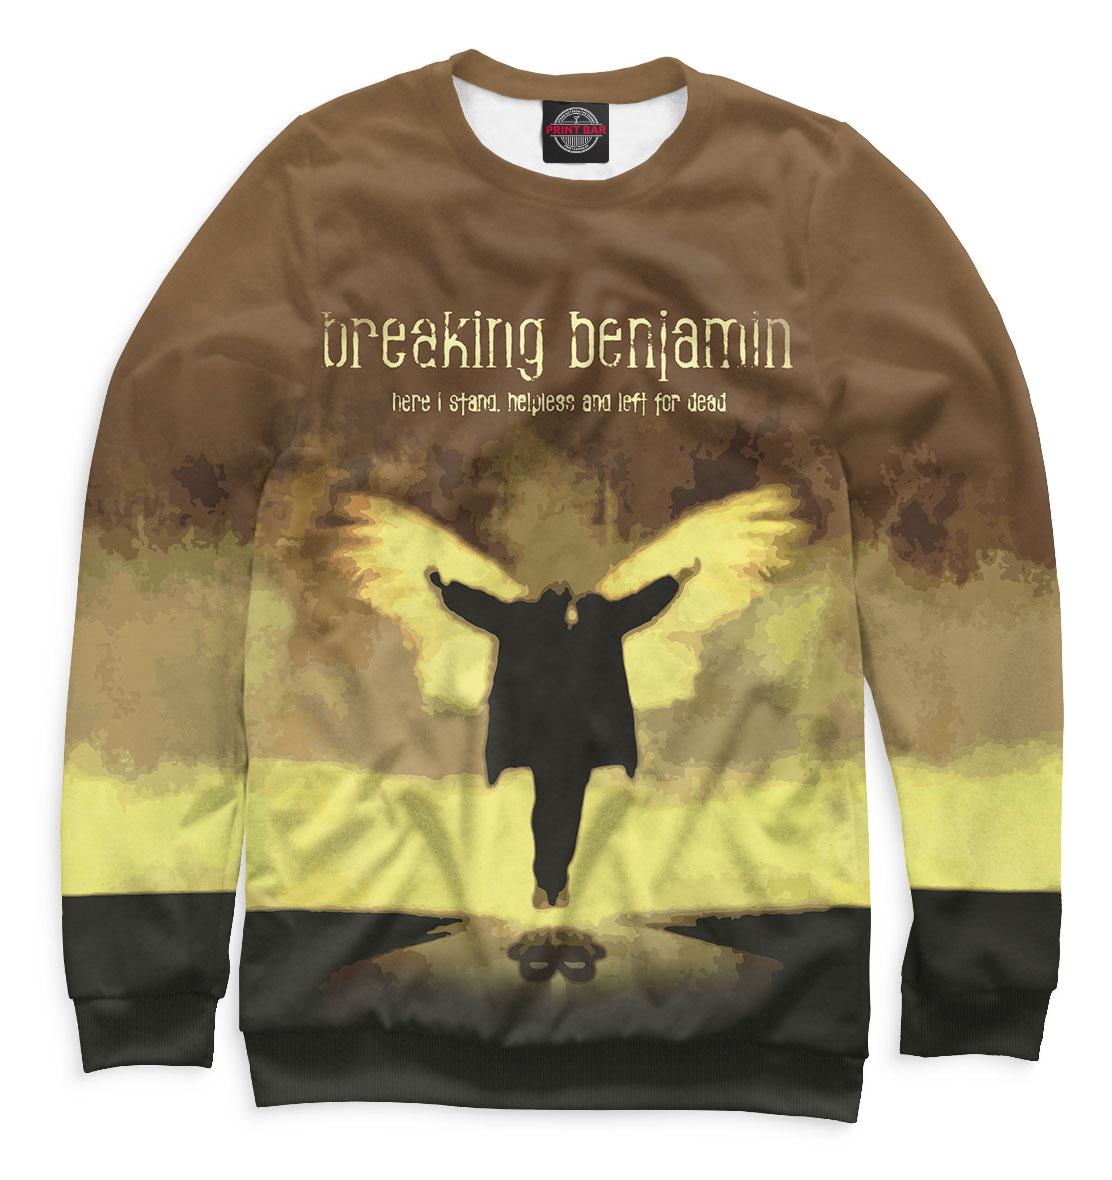 Купить Breaking Benjamin, Printbar, Свитшоты, BNJ-213191-swi-2